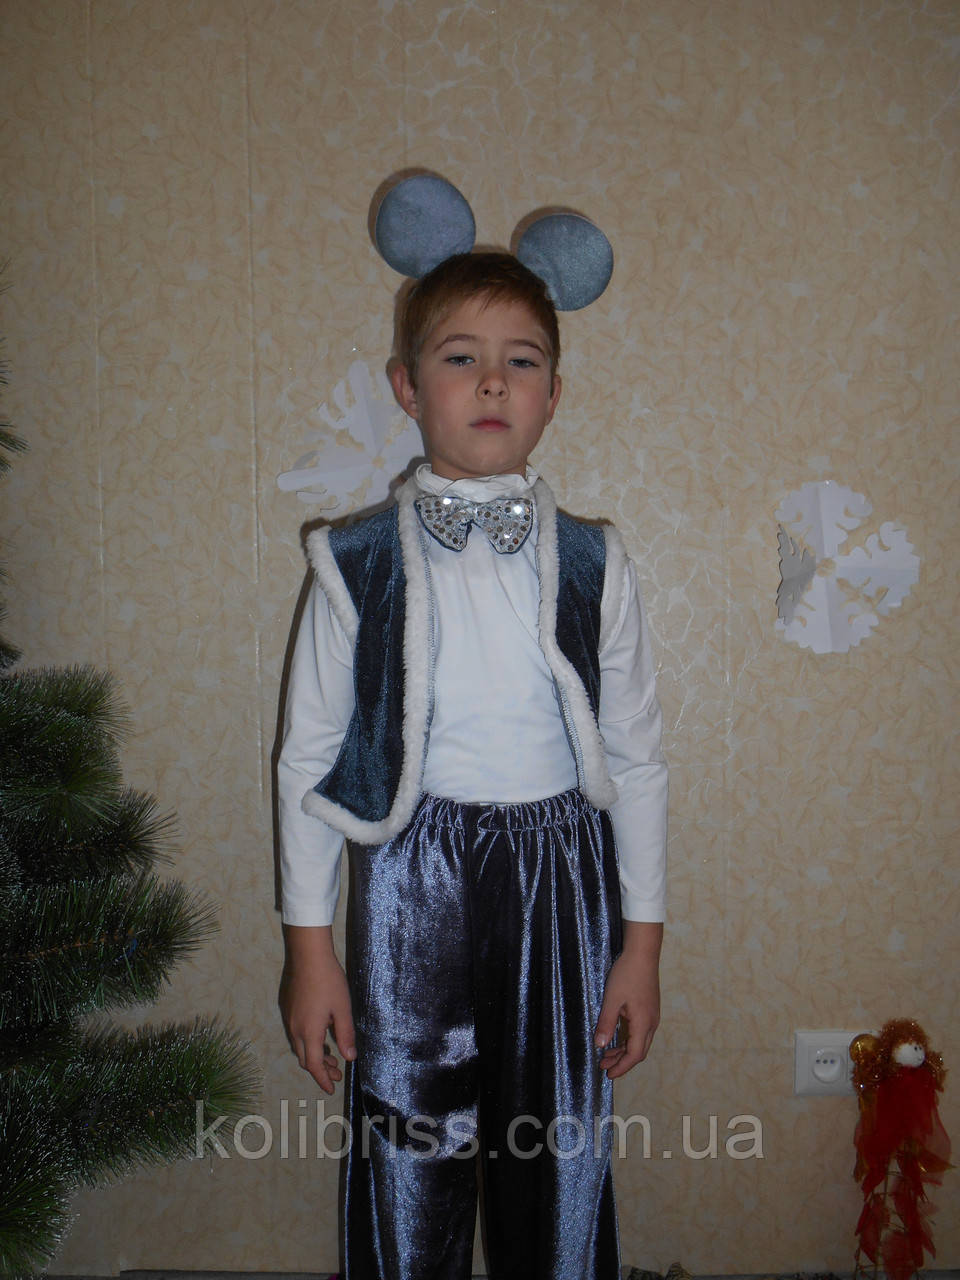 Костюм  мышонка прокат Киев. Костюм мышонок, мышь прокат